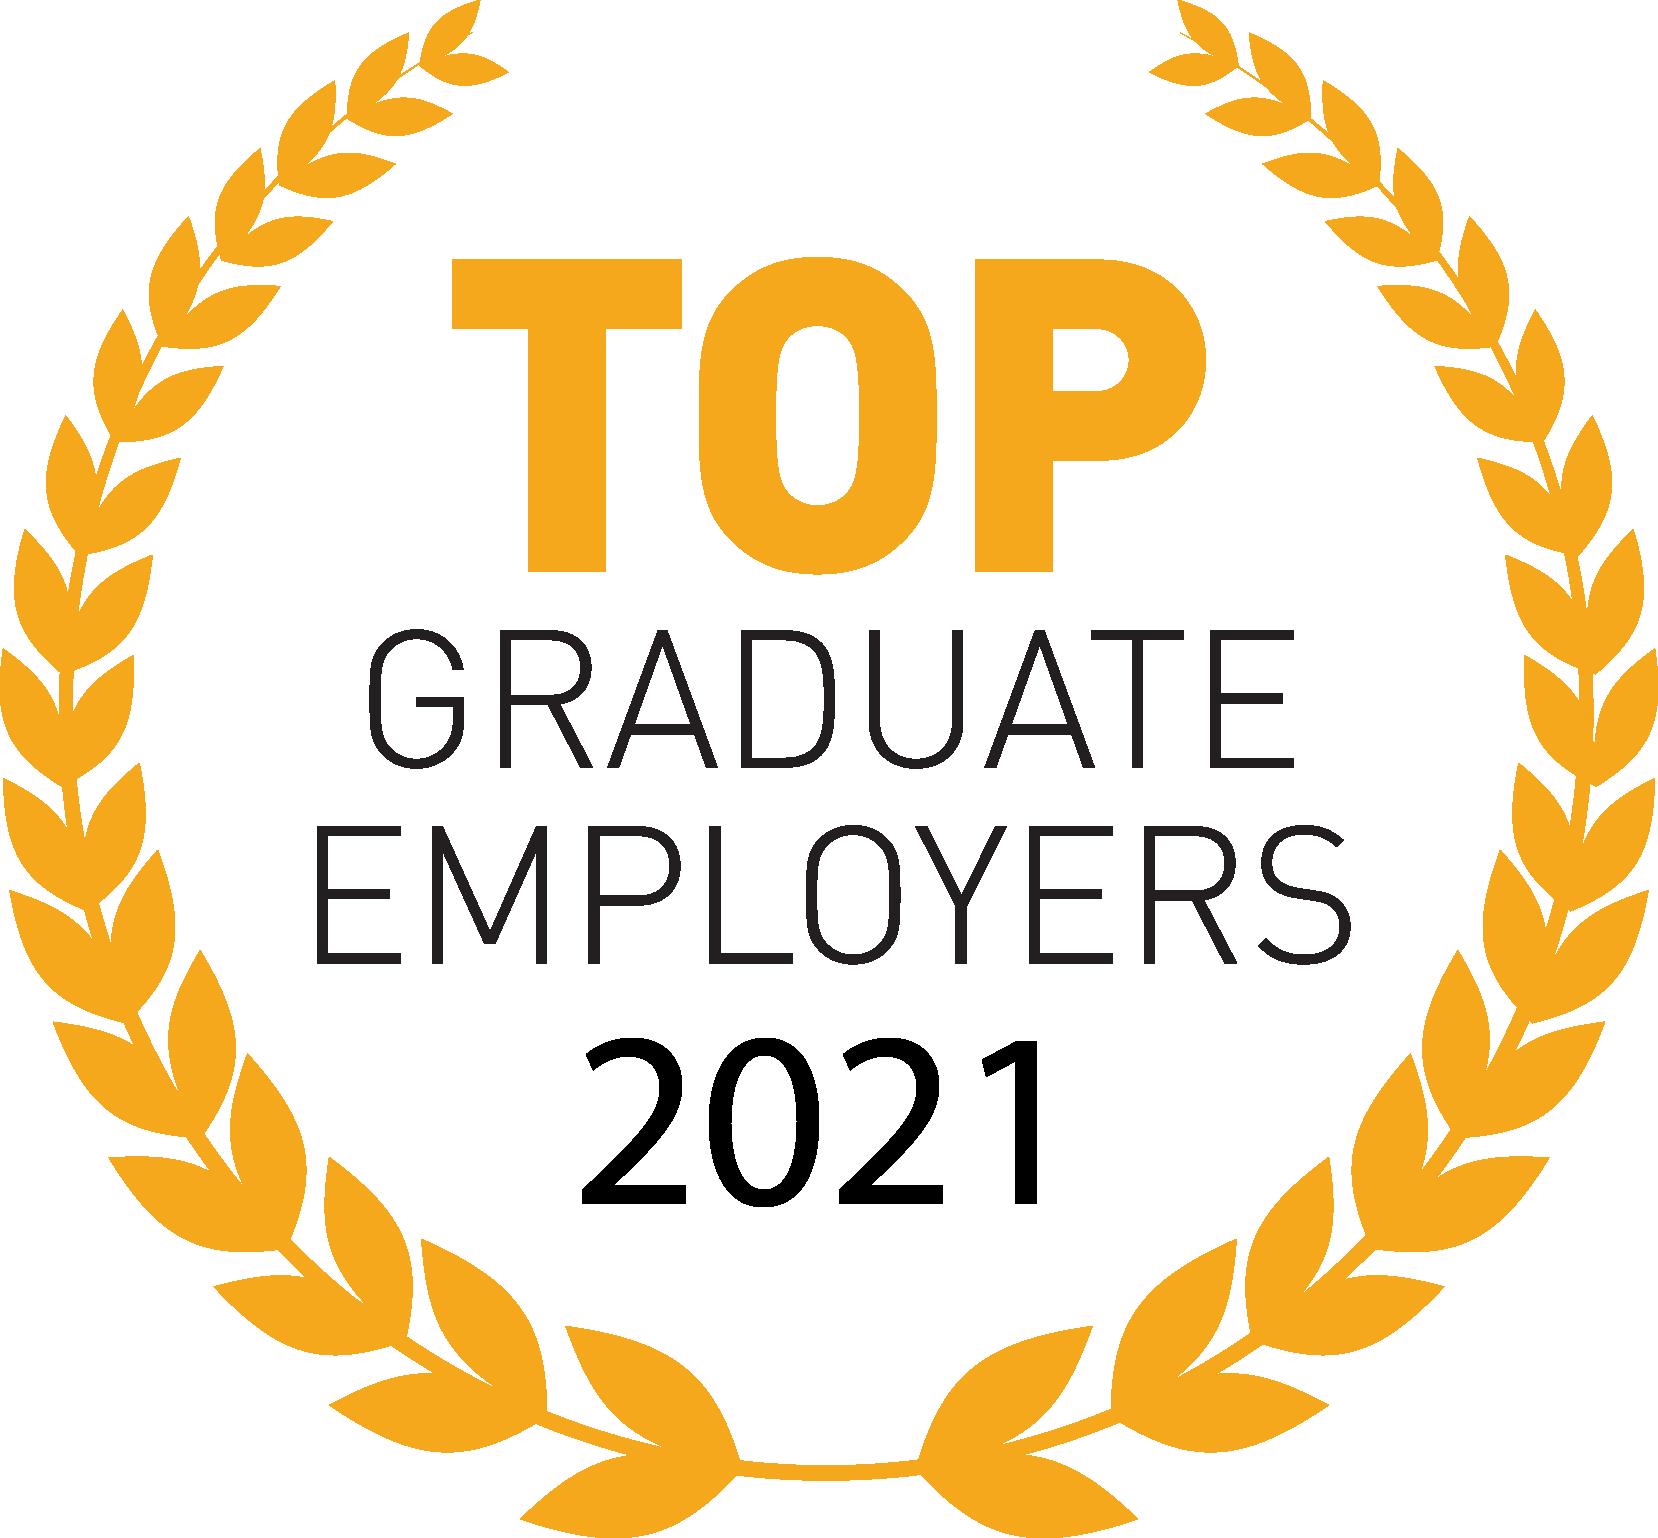 Top Graduate Employer 2021 Award